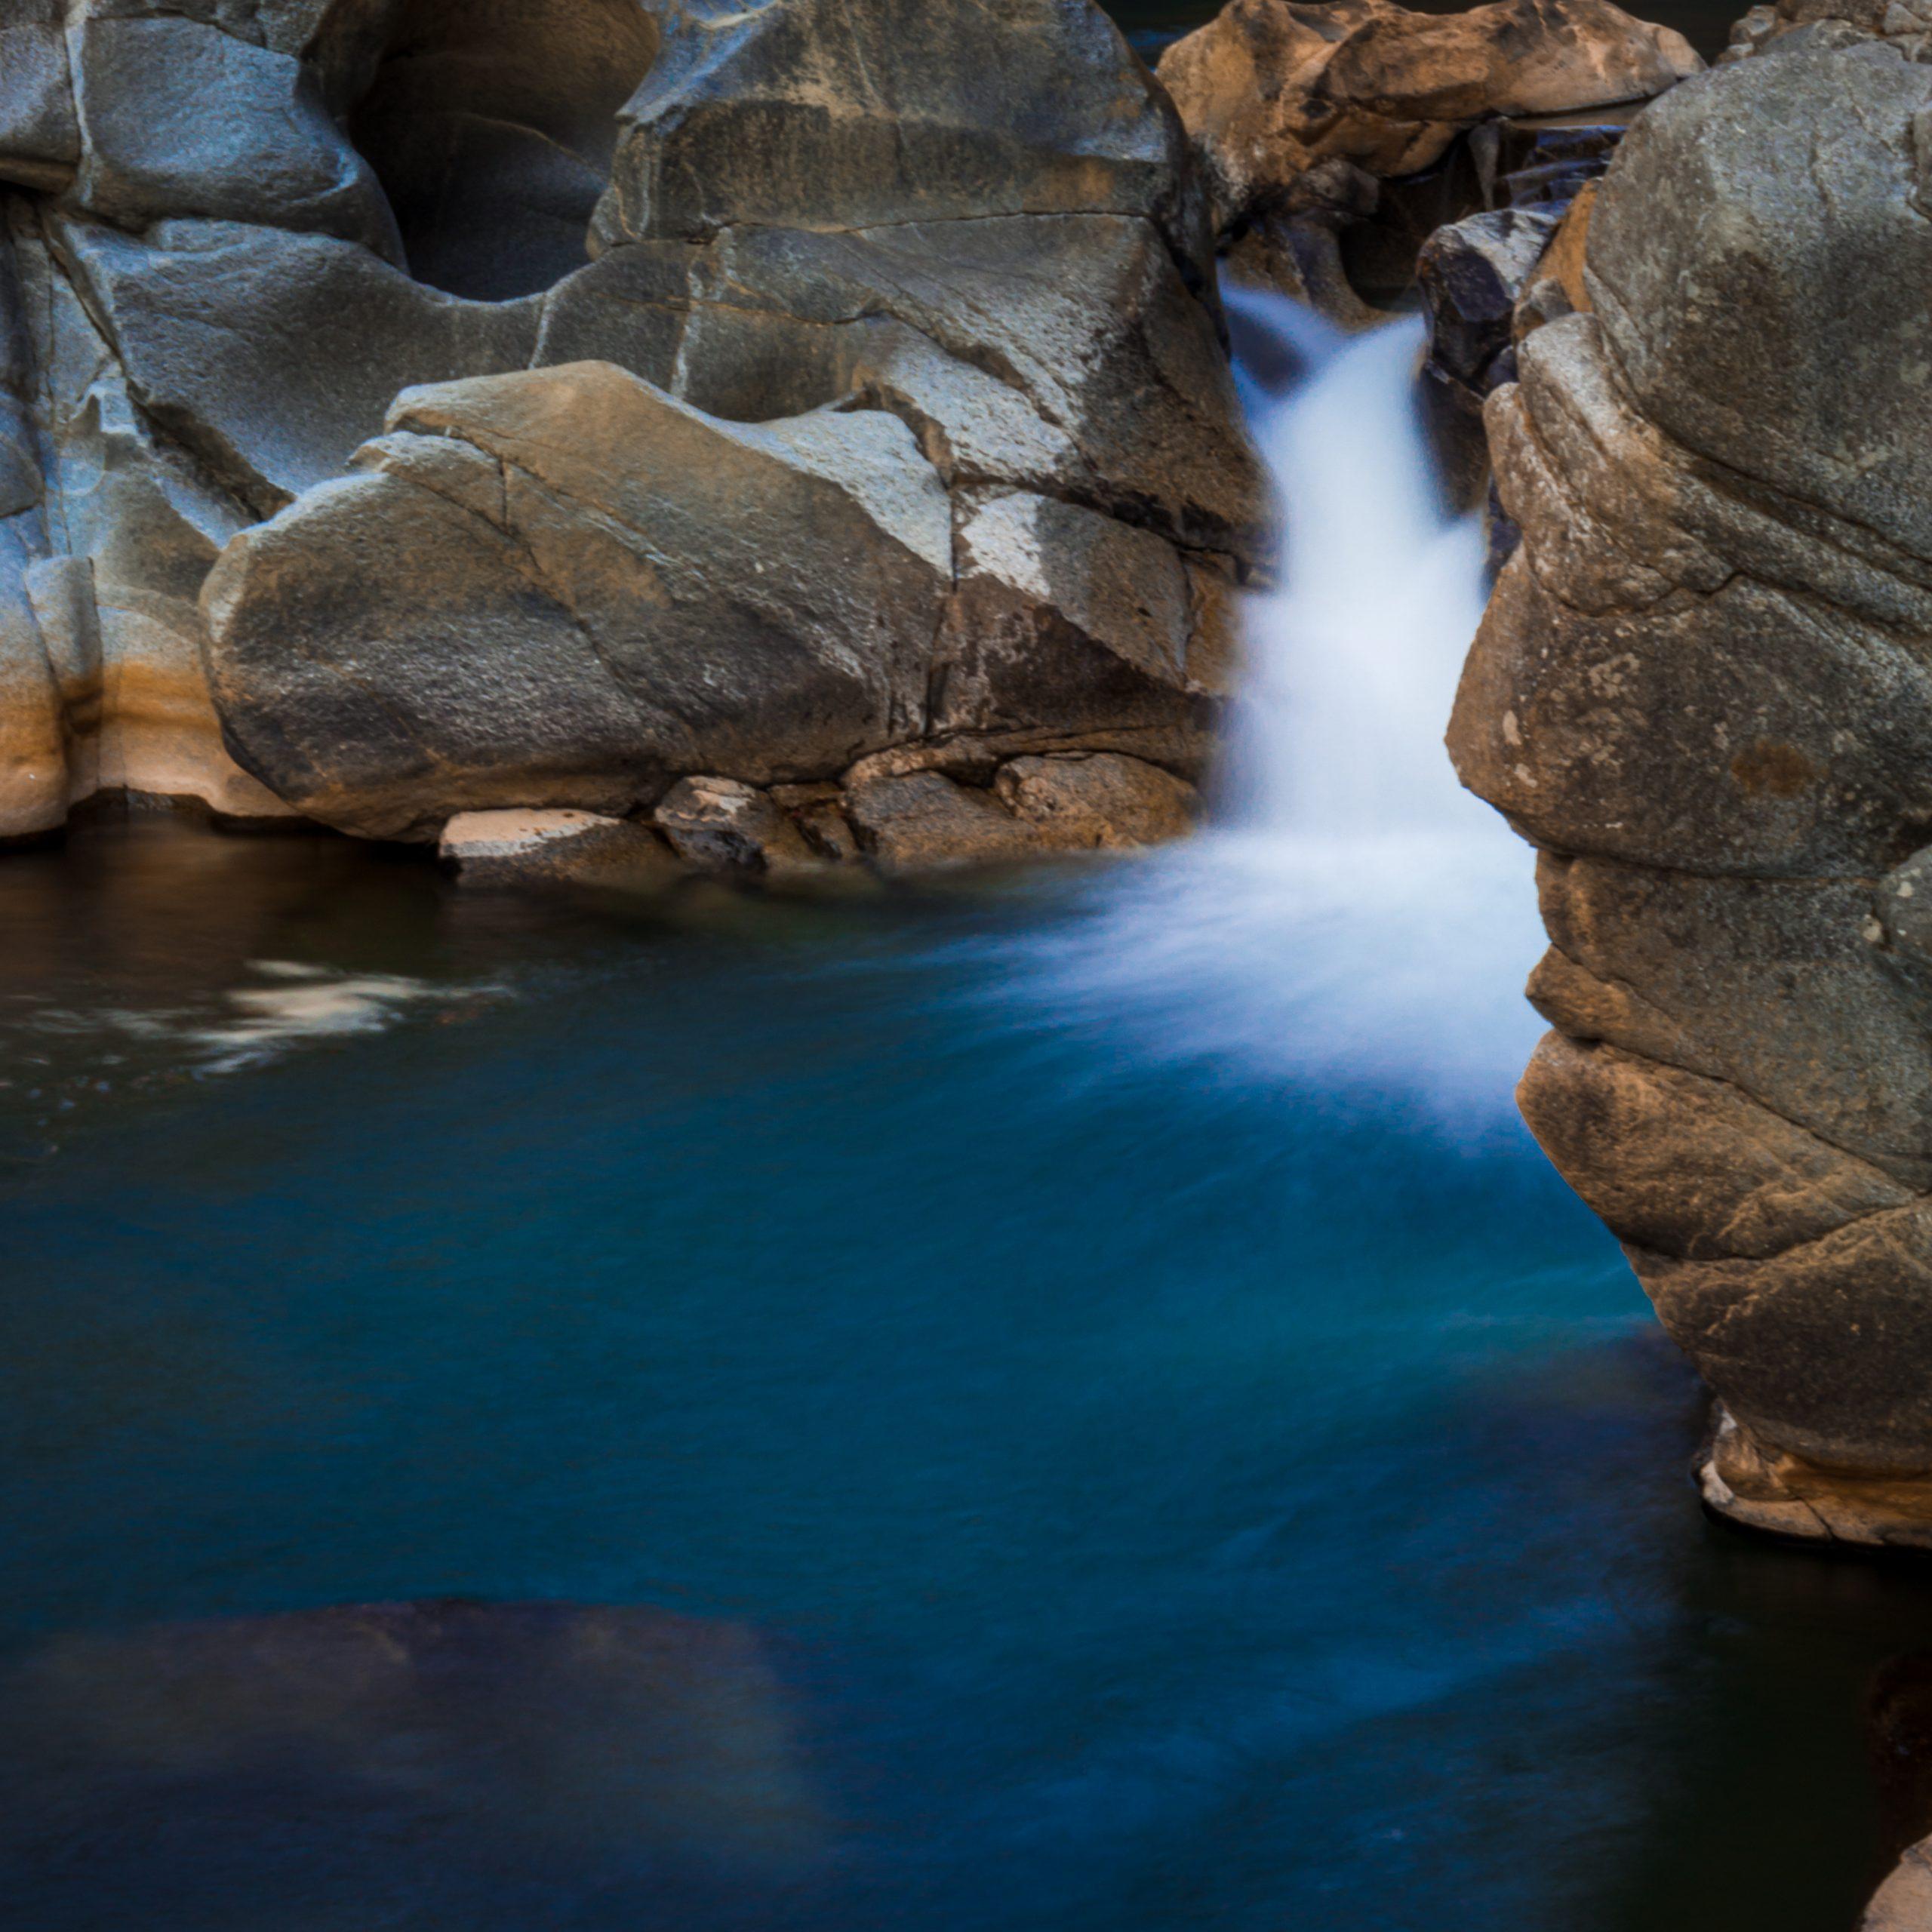 beautiful snap of waterfall and rocks